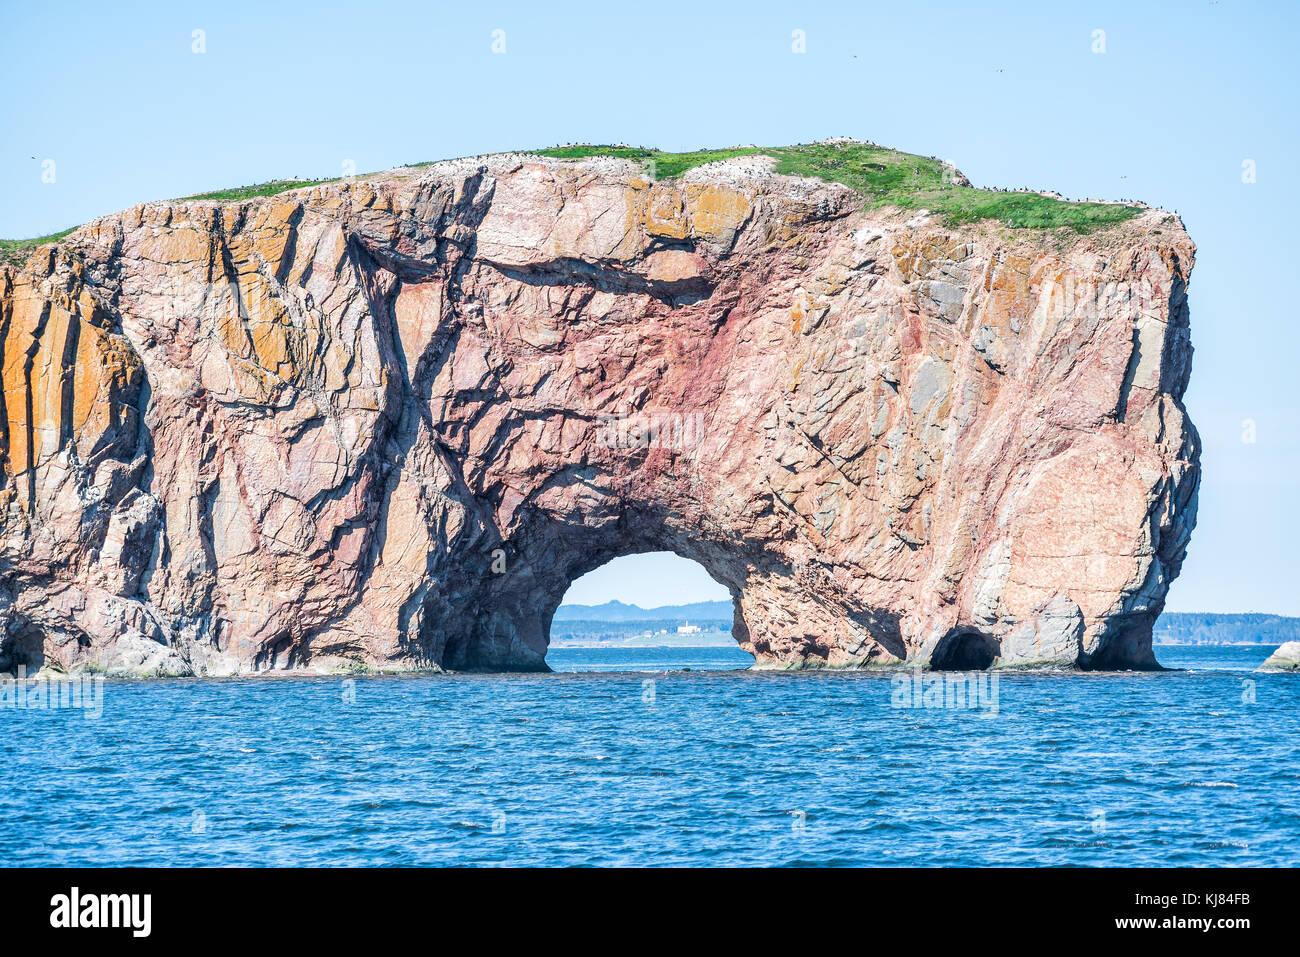 Rocher Perce rock in Gaspe Peninsula, Quebec, Gaspesie region closeup with blue water - Stock Image